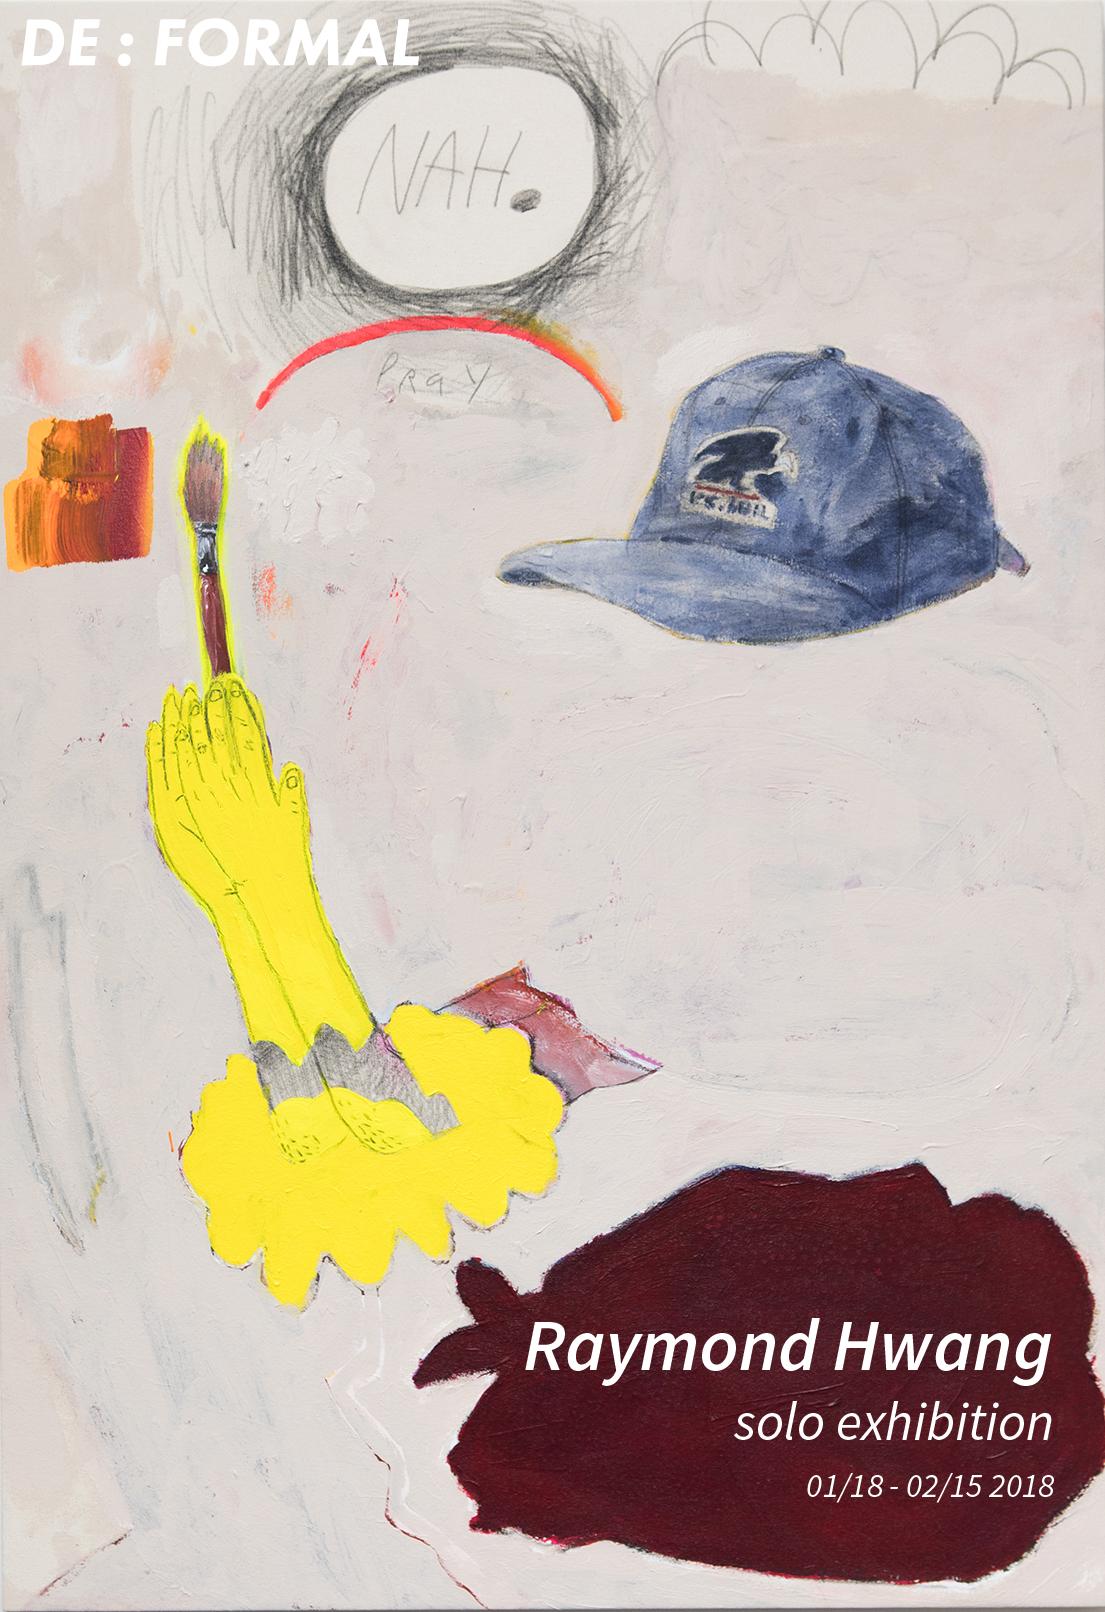 Raymond_Hwang poster-01.jpg